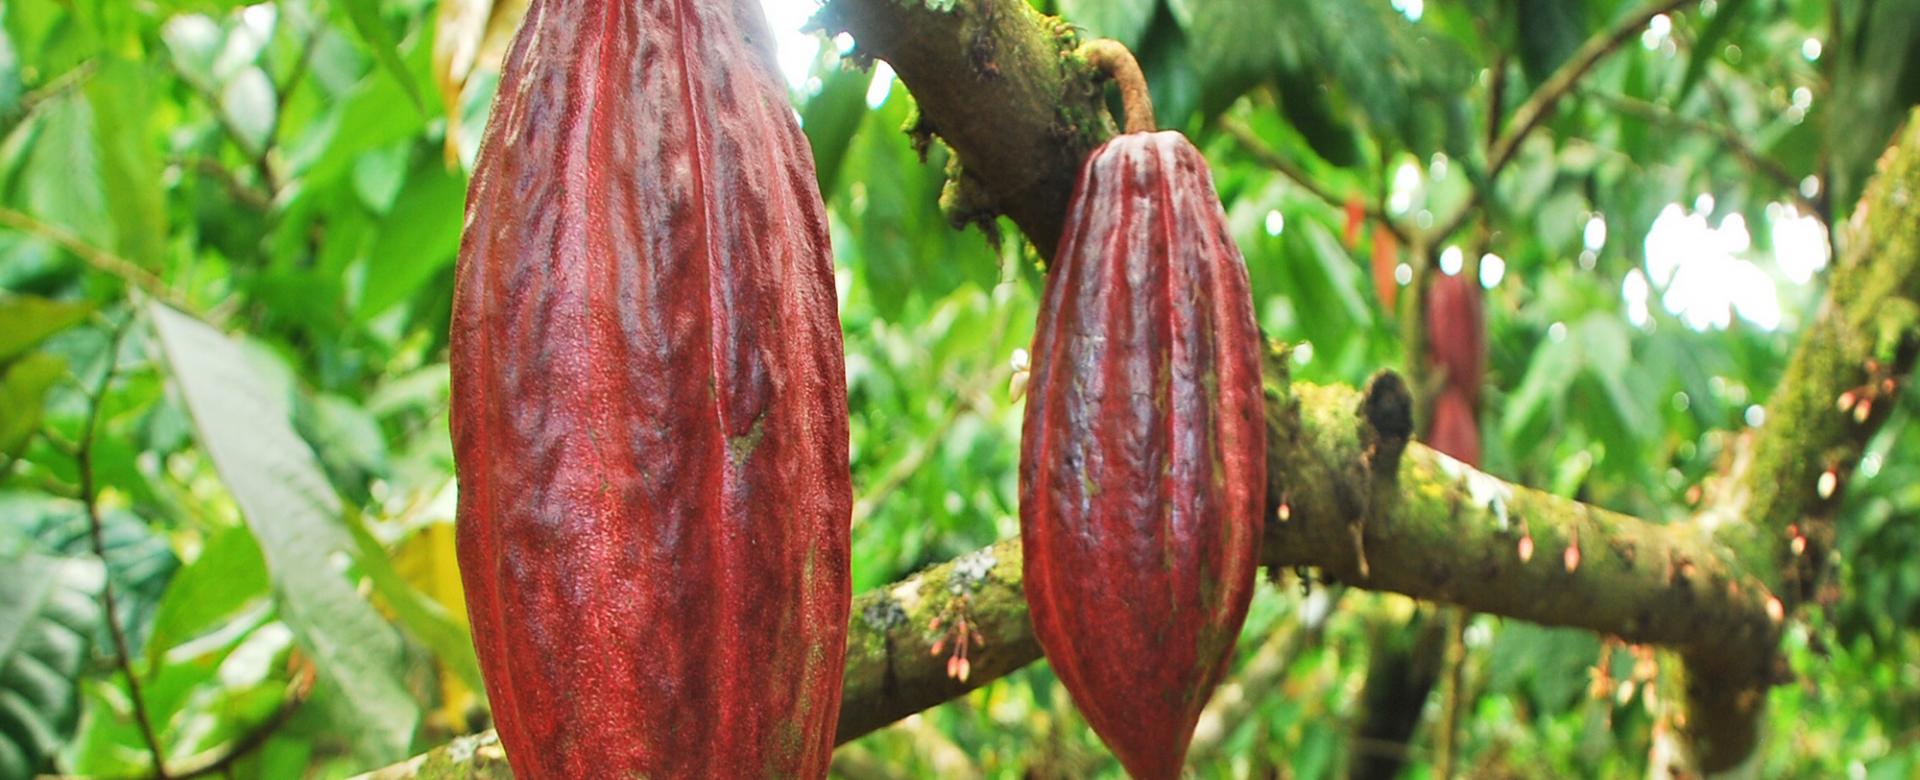 Chocolate farm in Go Cong, Tien Giang